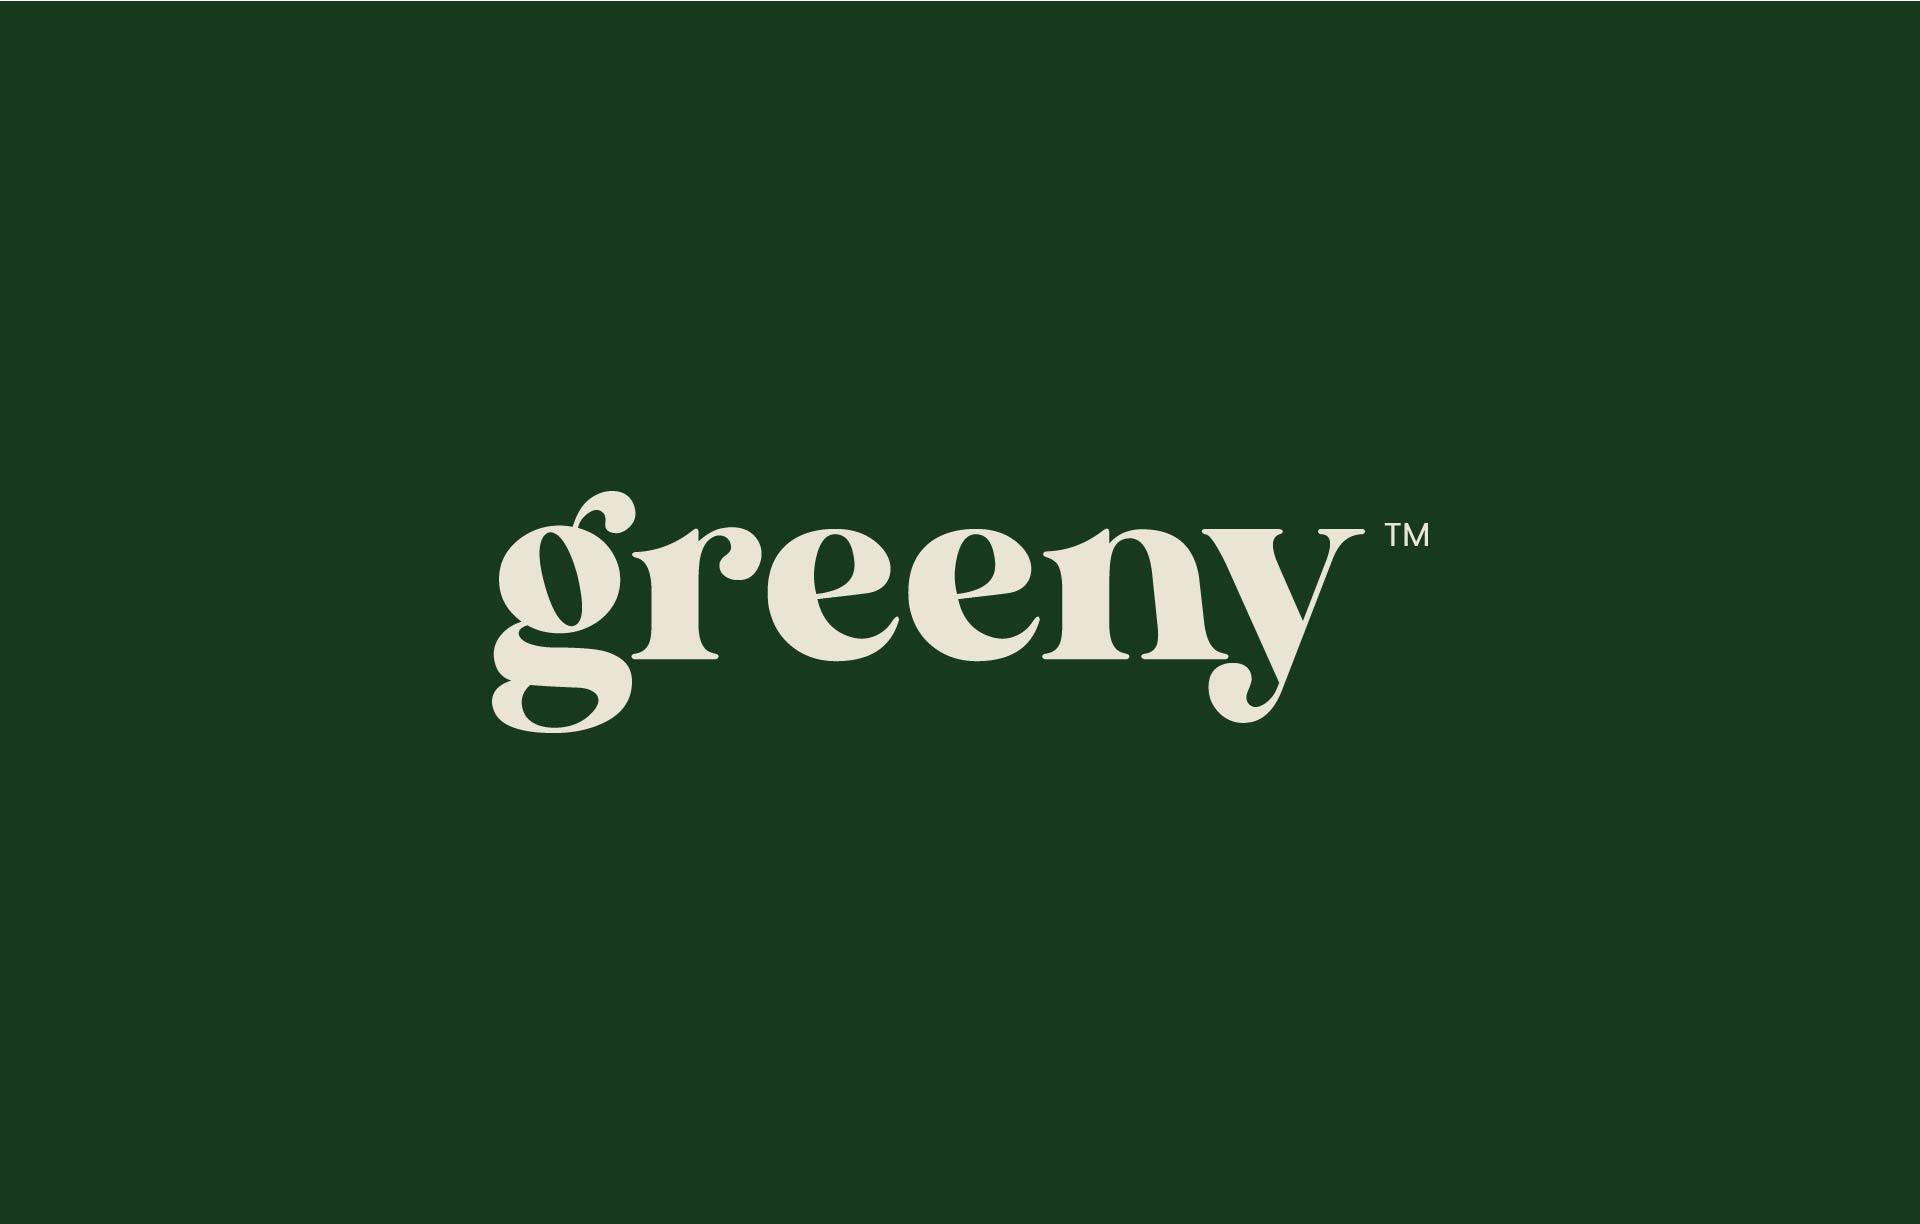 Greeny dark logo